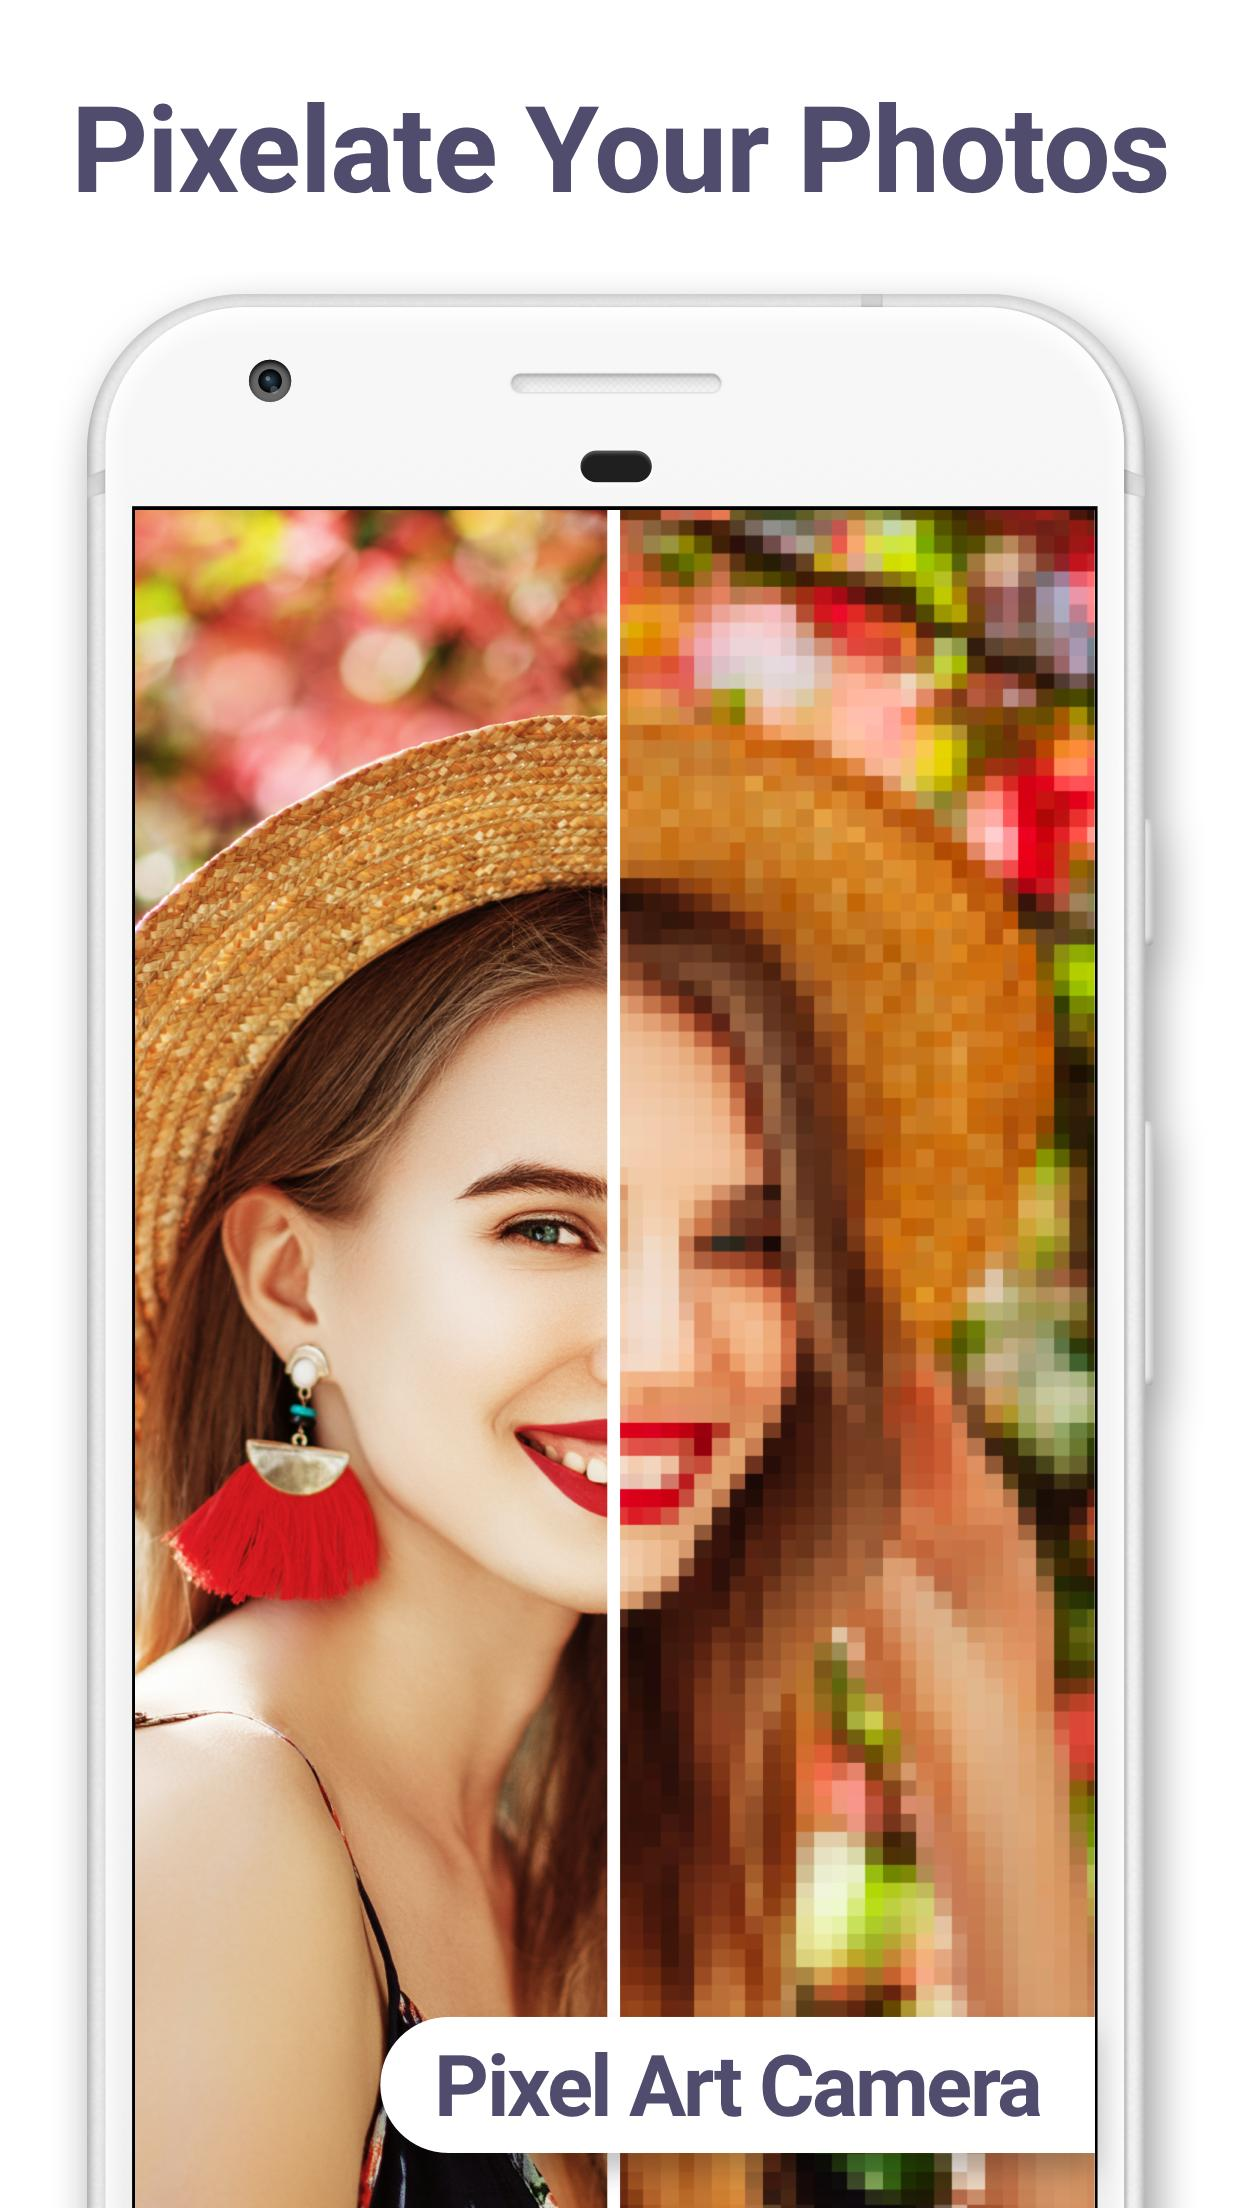 Pixel Art Color by Number 5.1.3 Screenshot 6